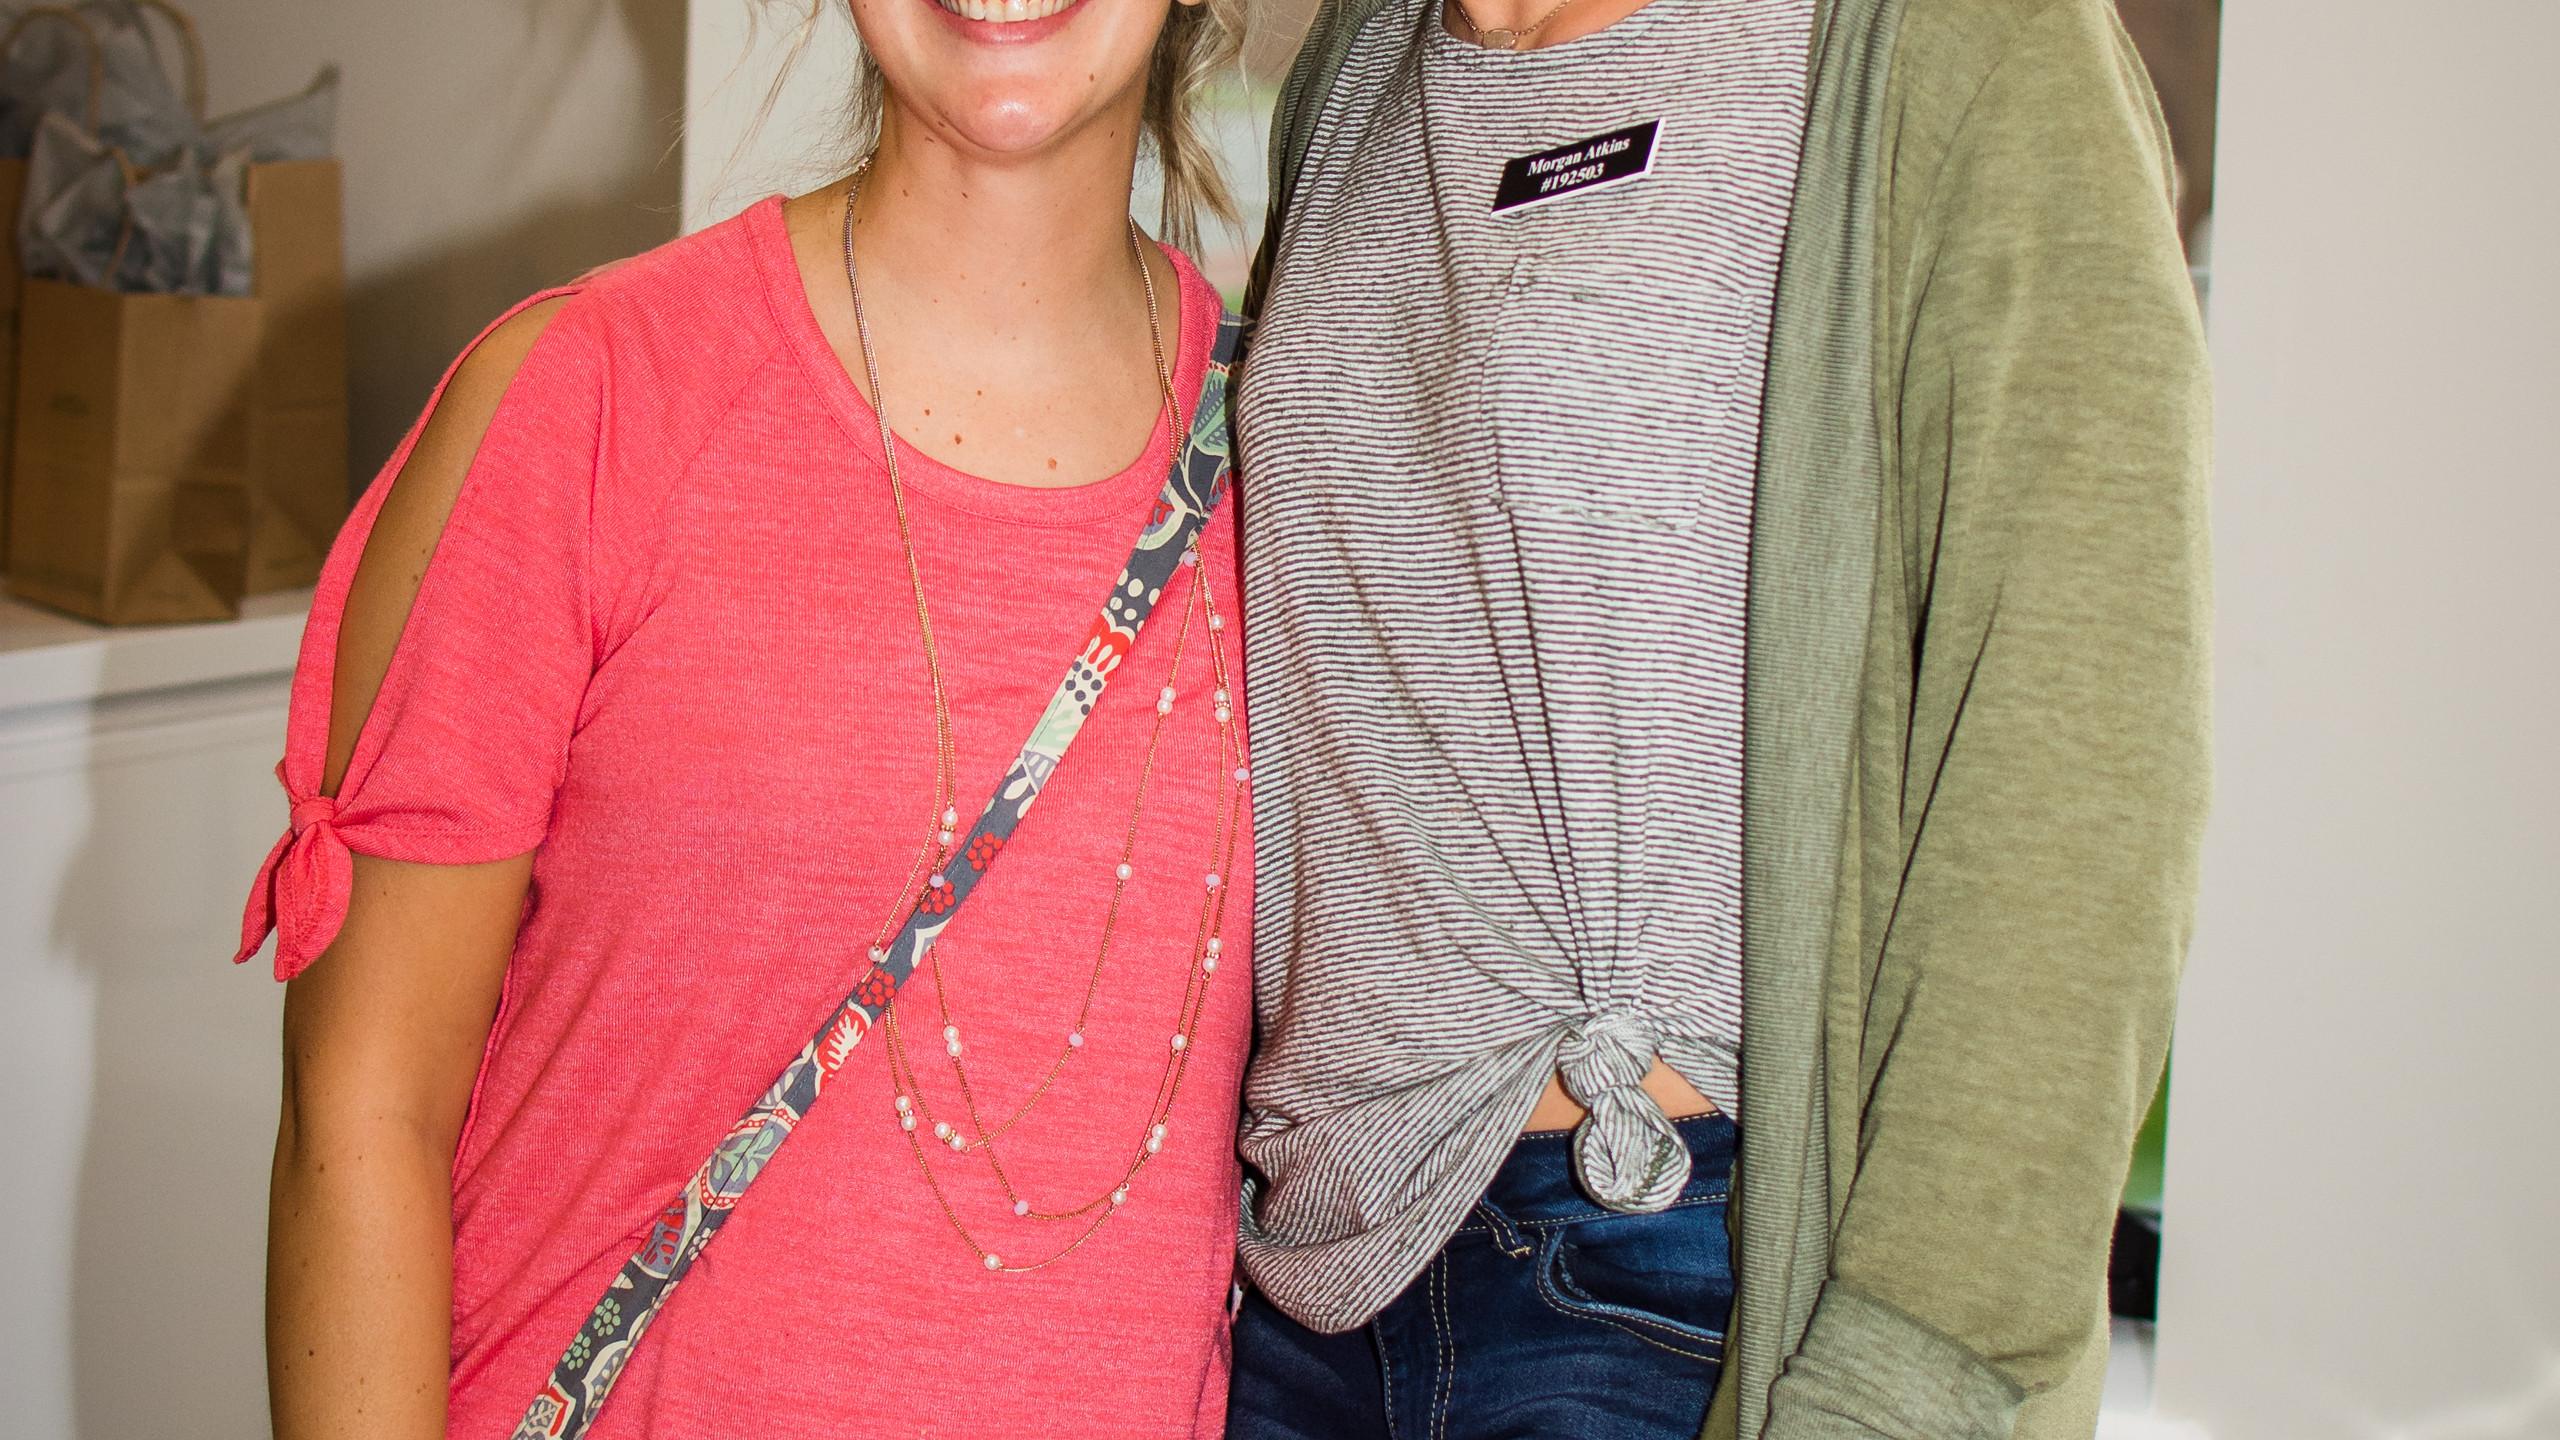 Kristen Koester and Morgan Atkins